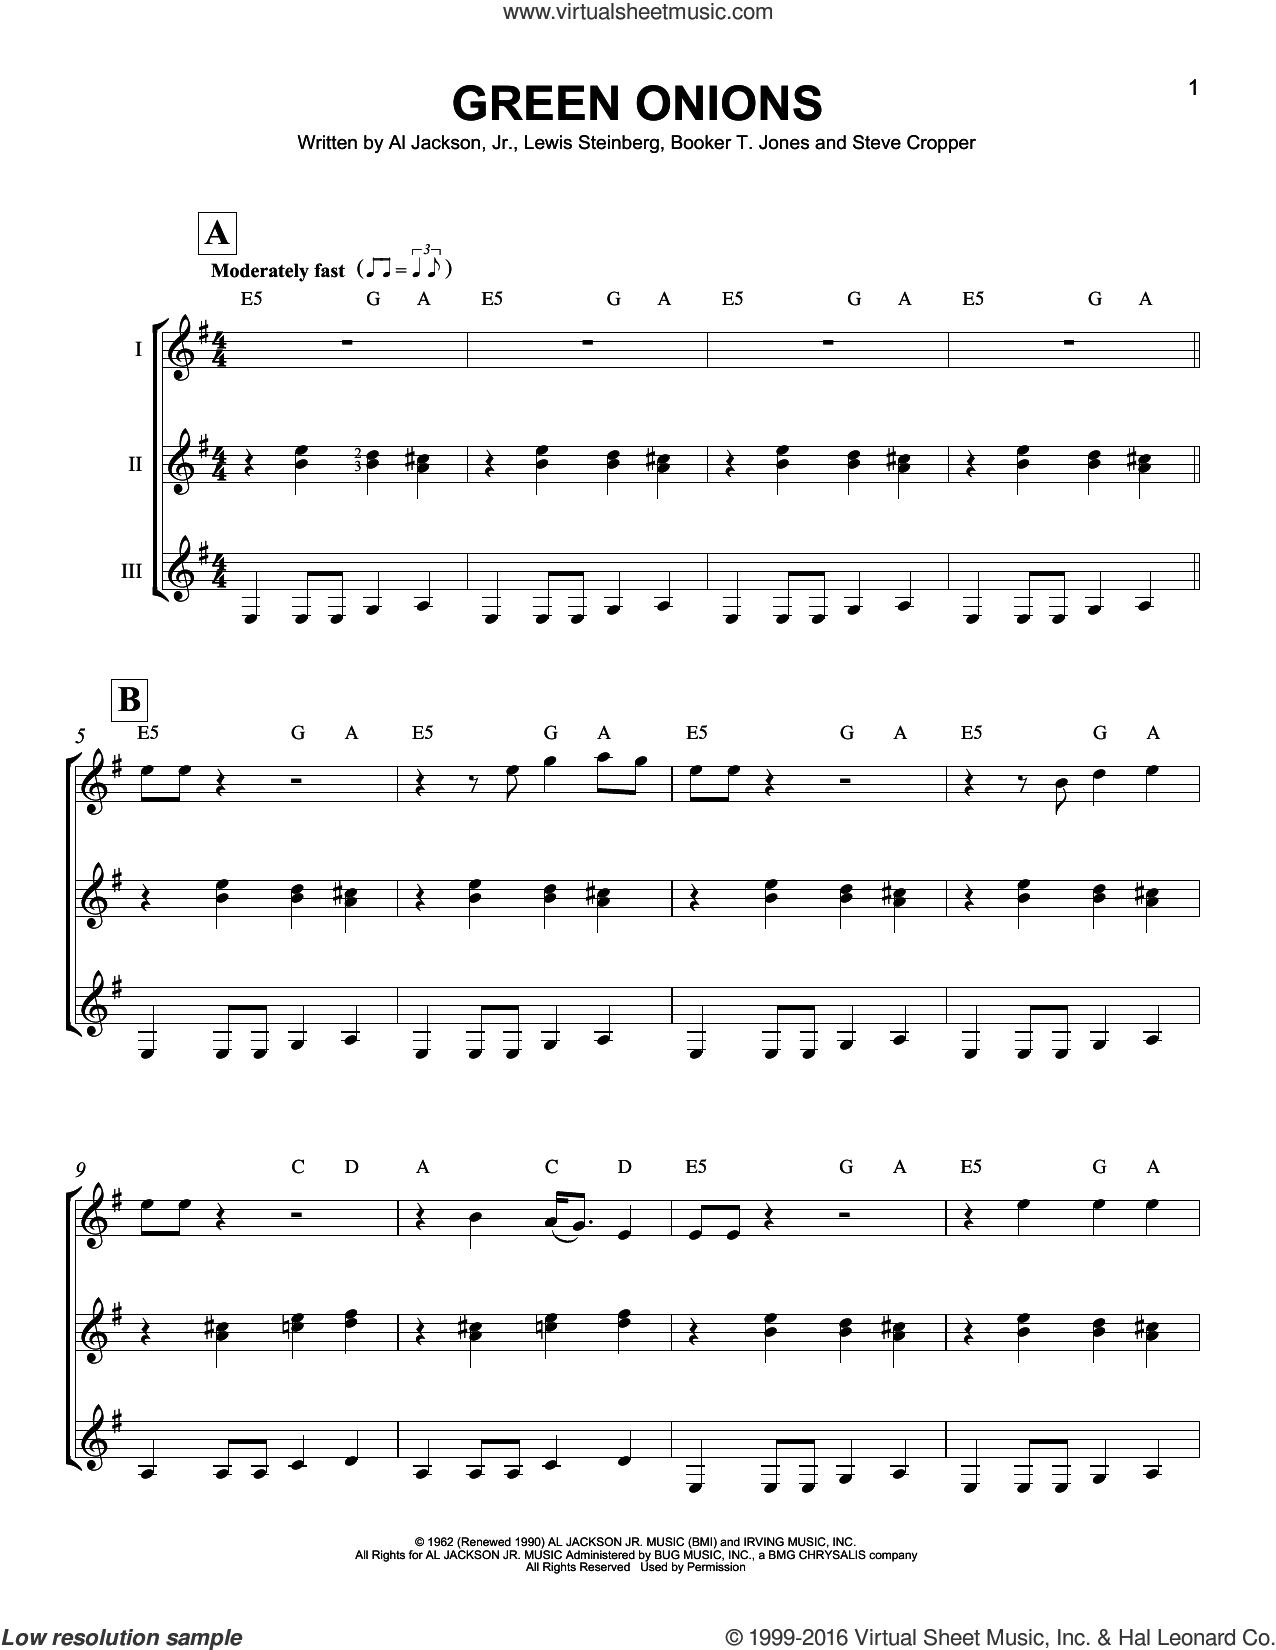 Green Onions sheet music for guitar ensemble by Booker T. & The MG's, Al Jackson, Jr., Booker T. Jones, Lewis Steinberg and Steve Cropper, intermediate skill level